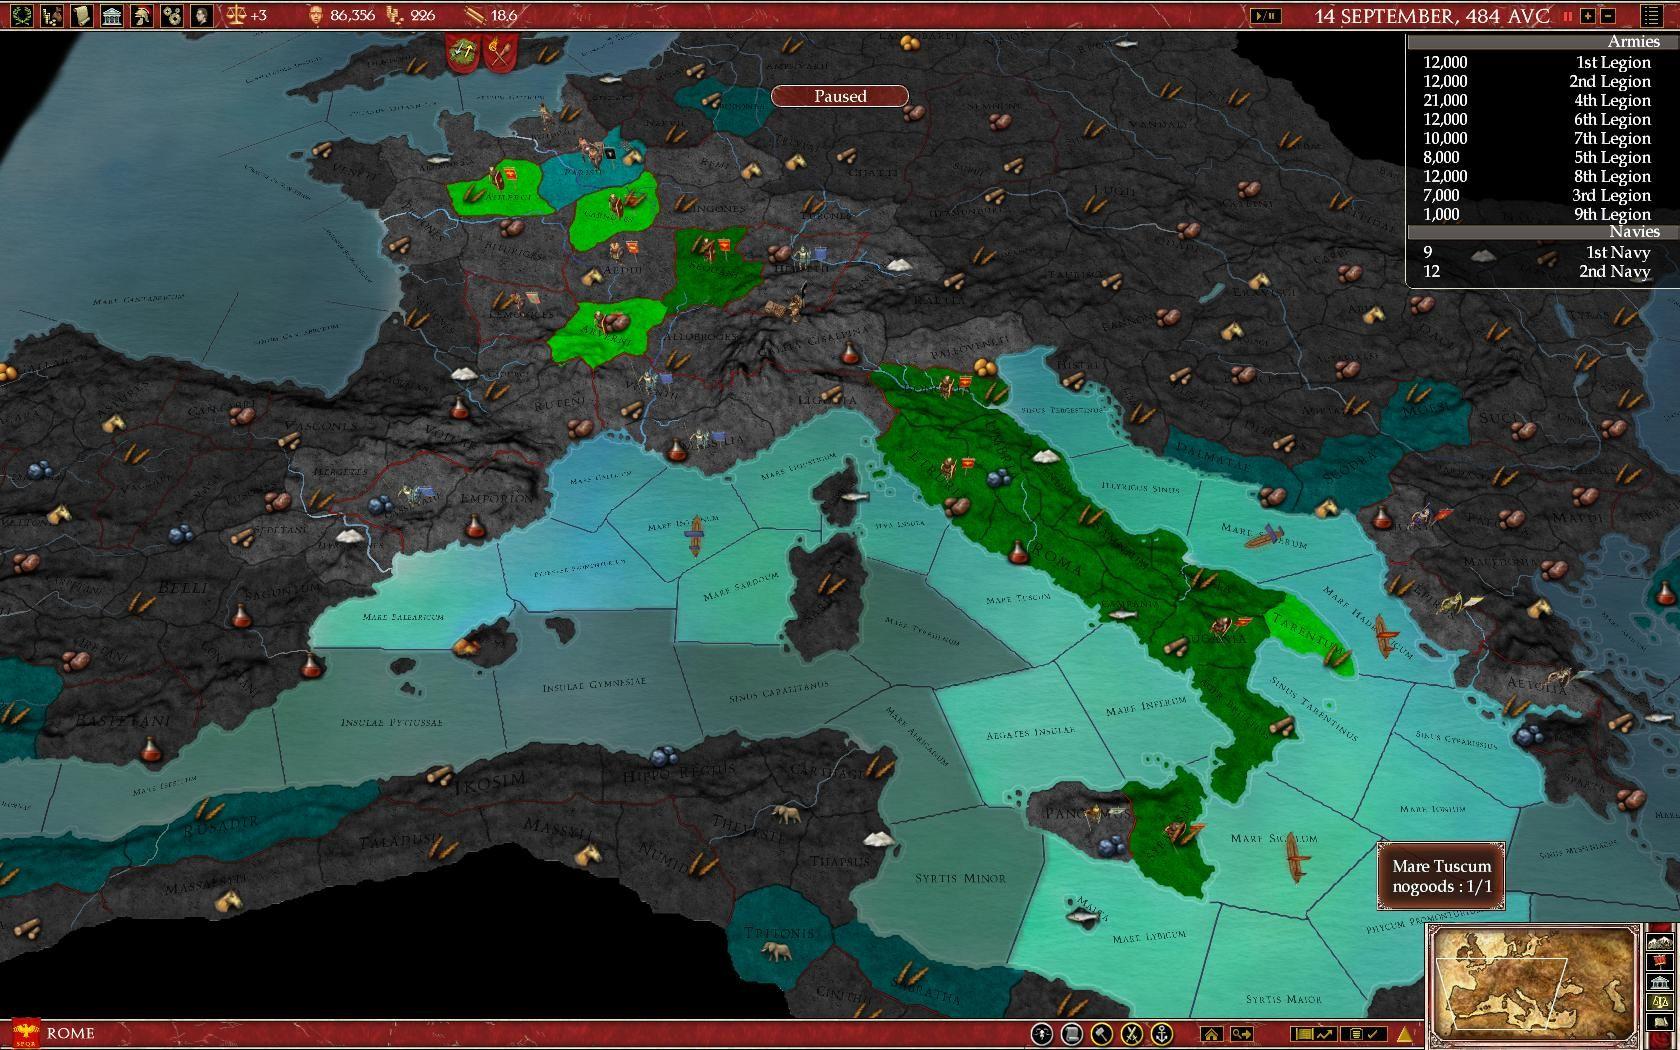 Europa universalis rome patch 21